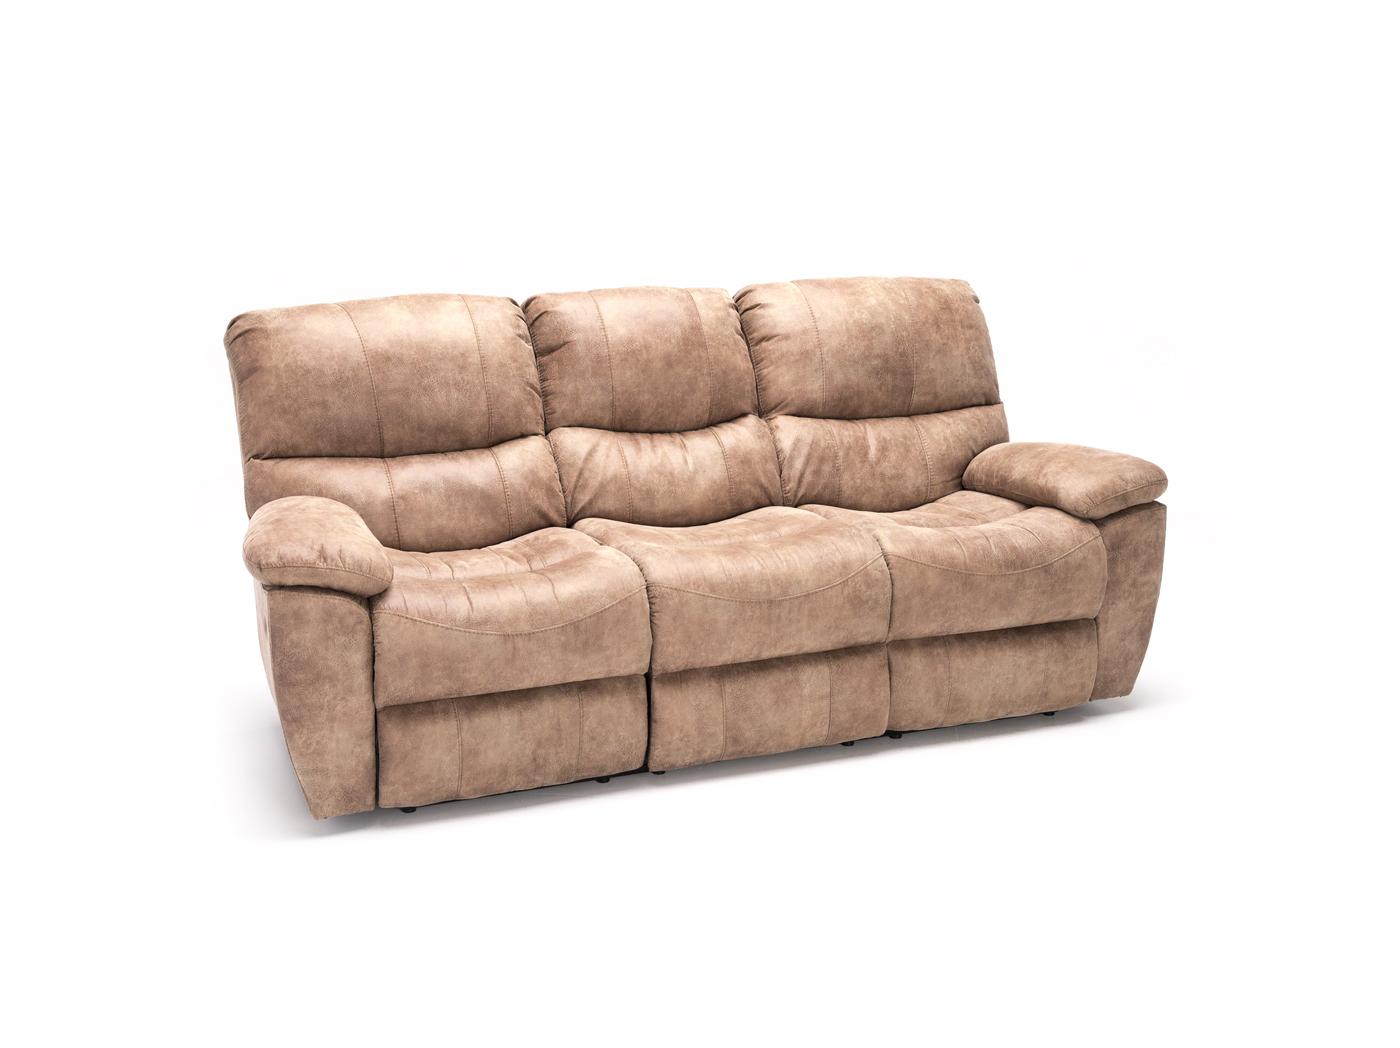 Direct Designs Dixie Recline Sofa